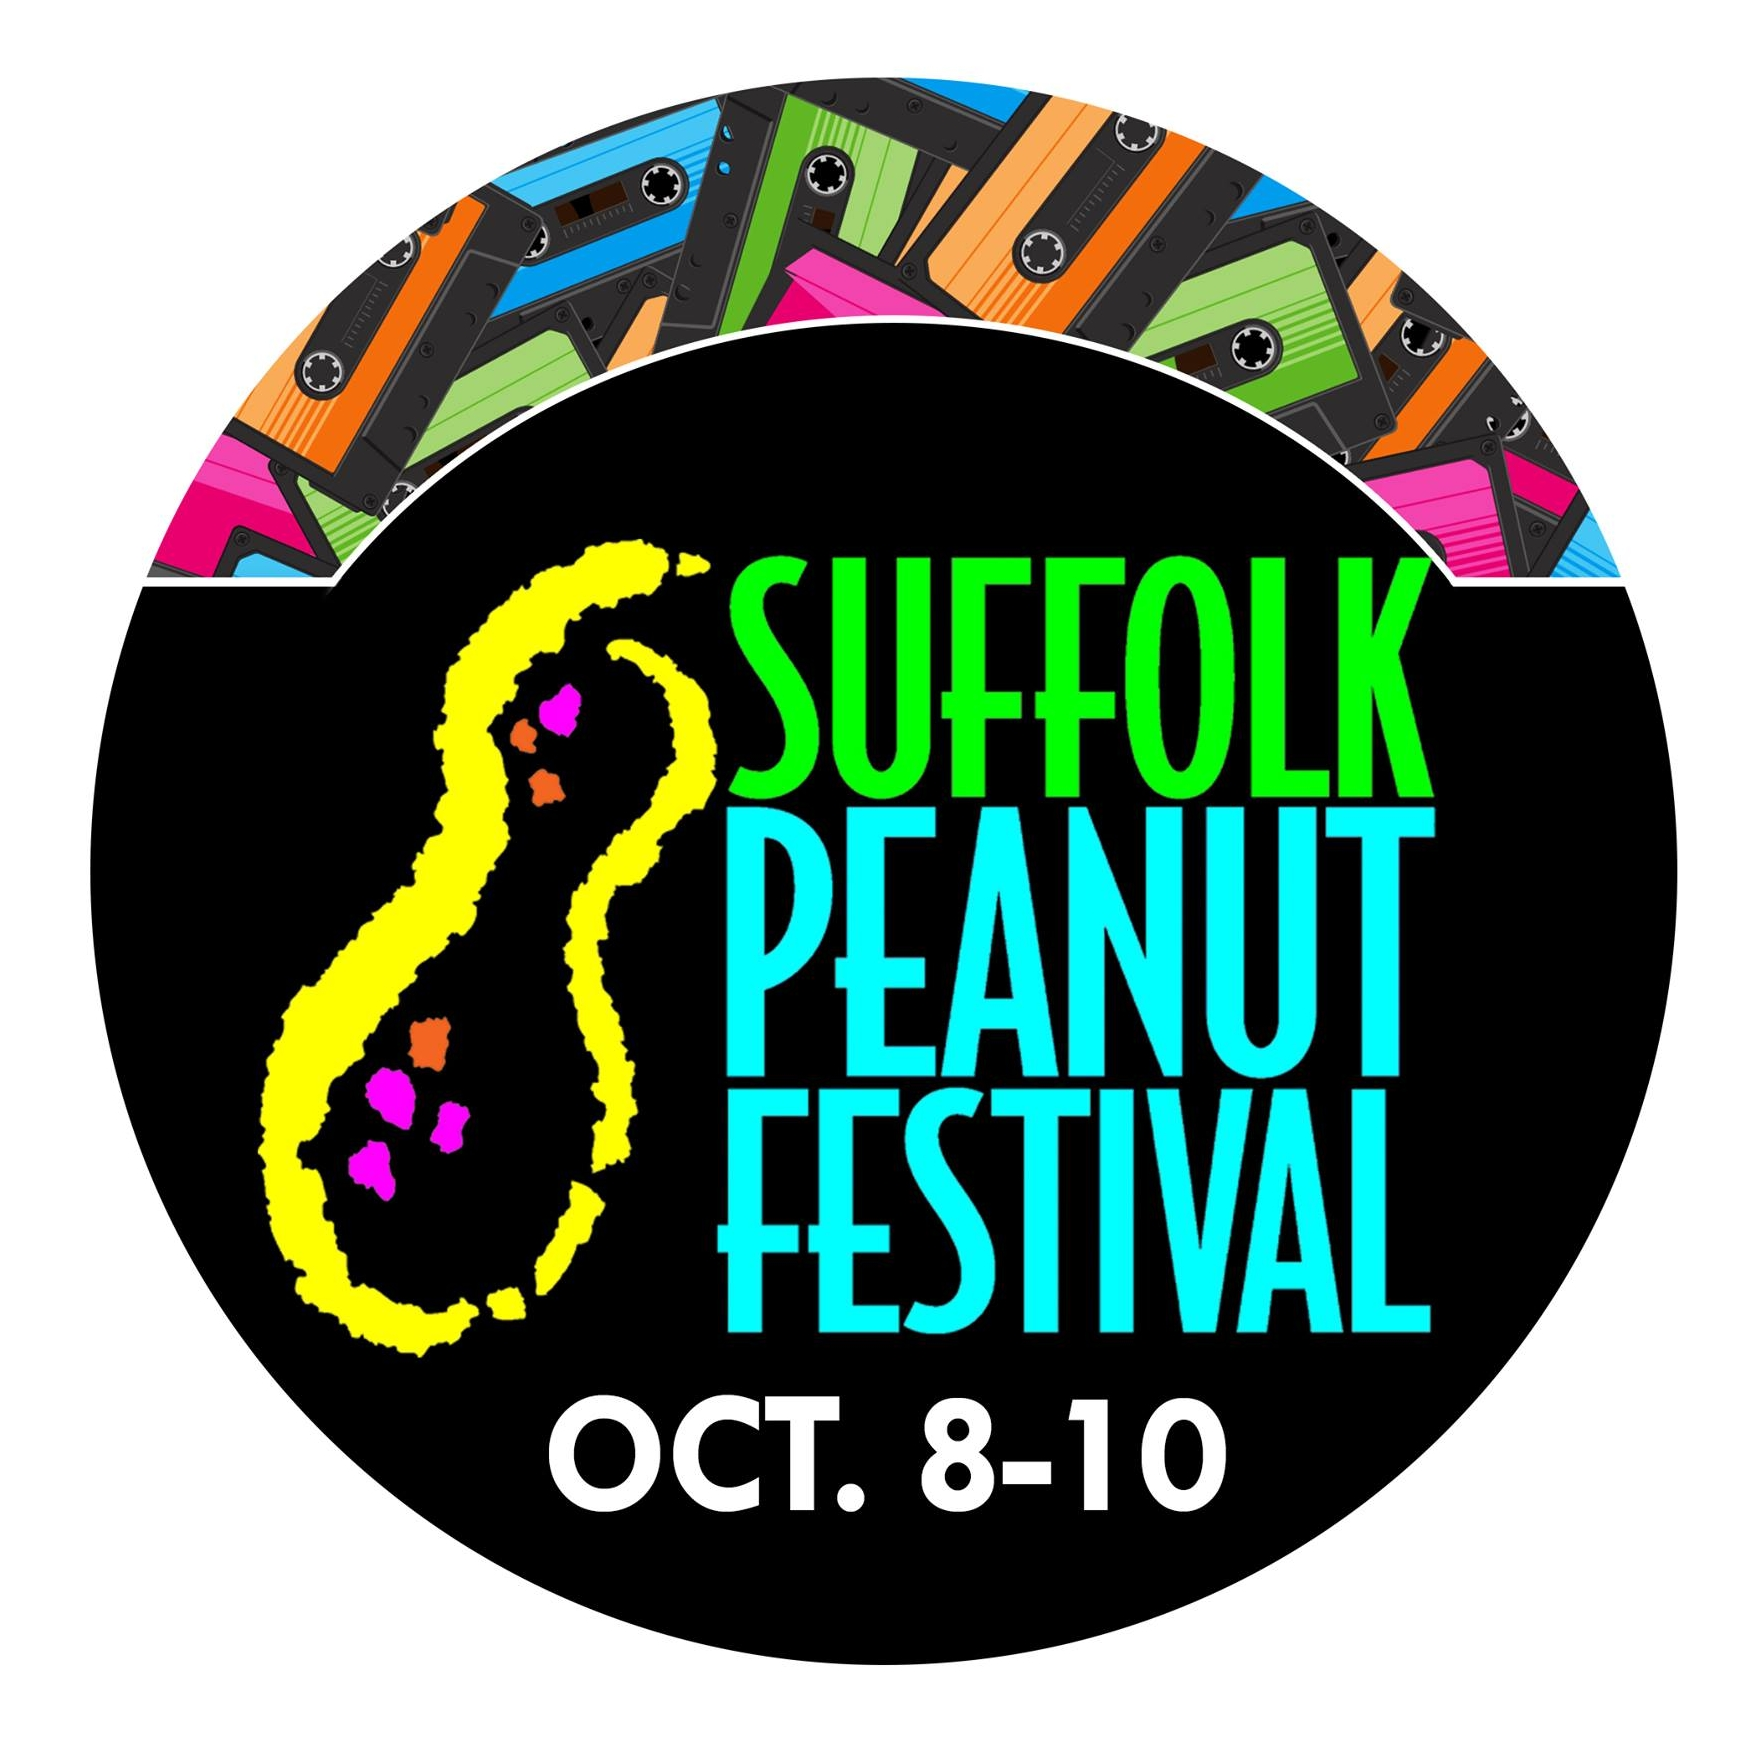 Suffolk Peanut Fest Set to Return This Fall